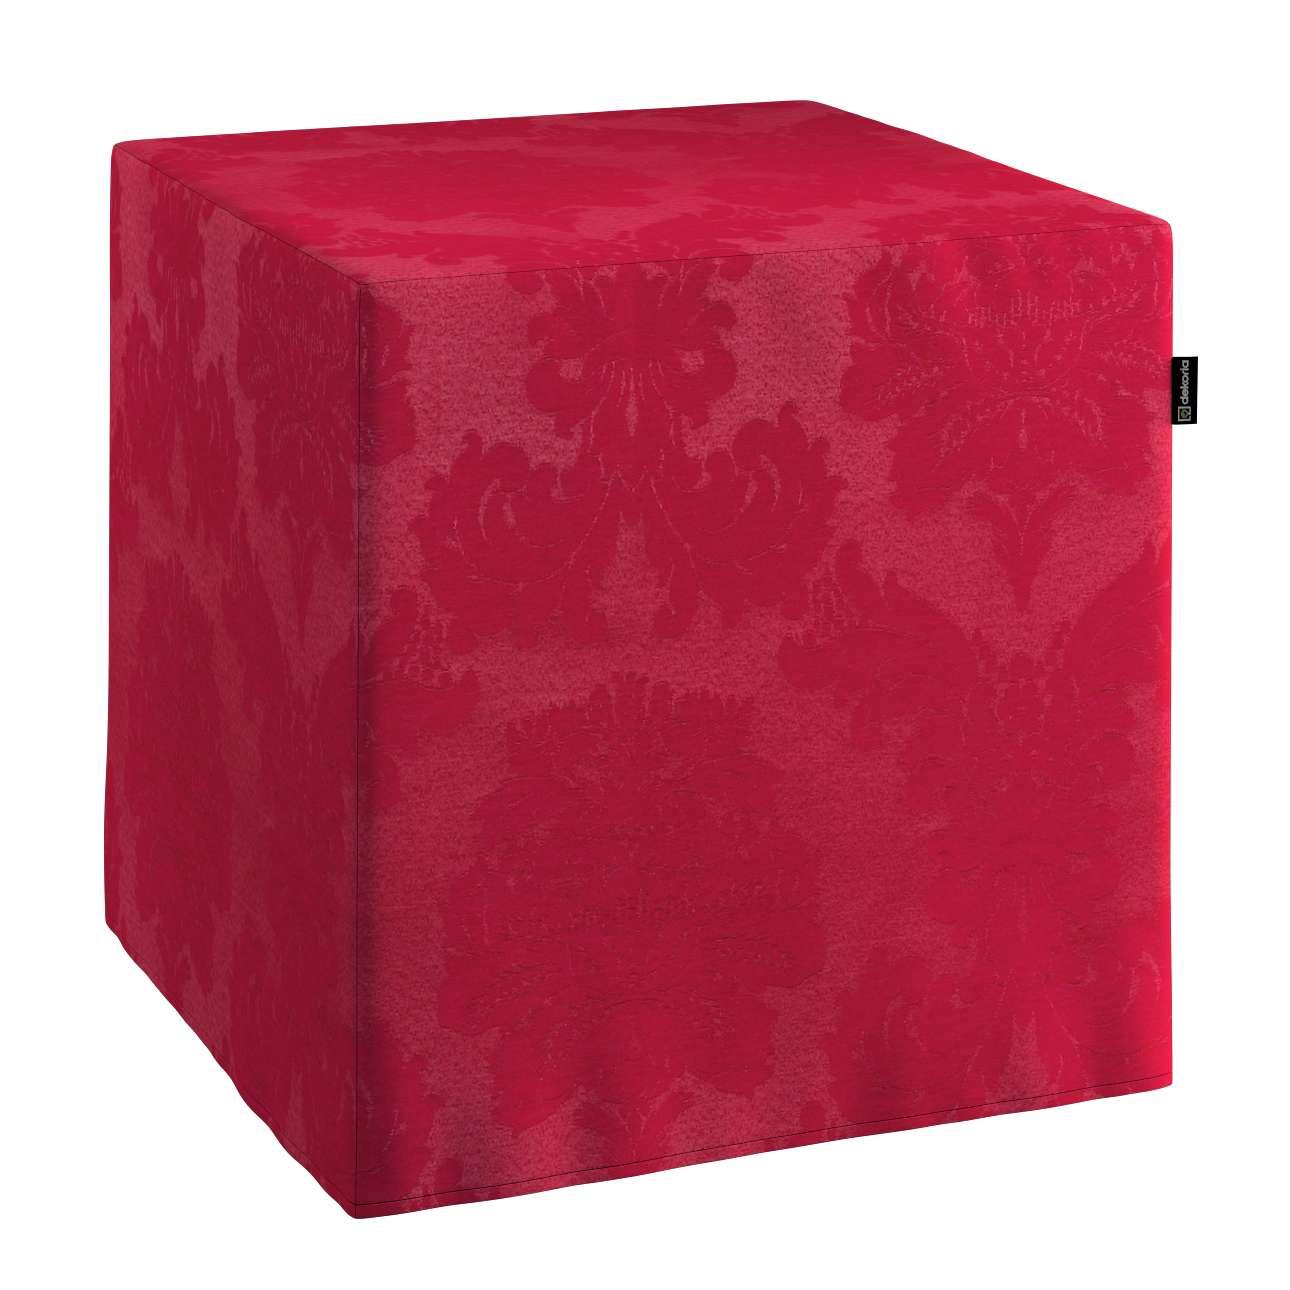 Sedák Cube - kostka pevná 40x40x40 v kolekci Damasco, látka: 613-13